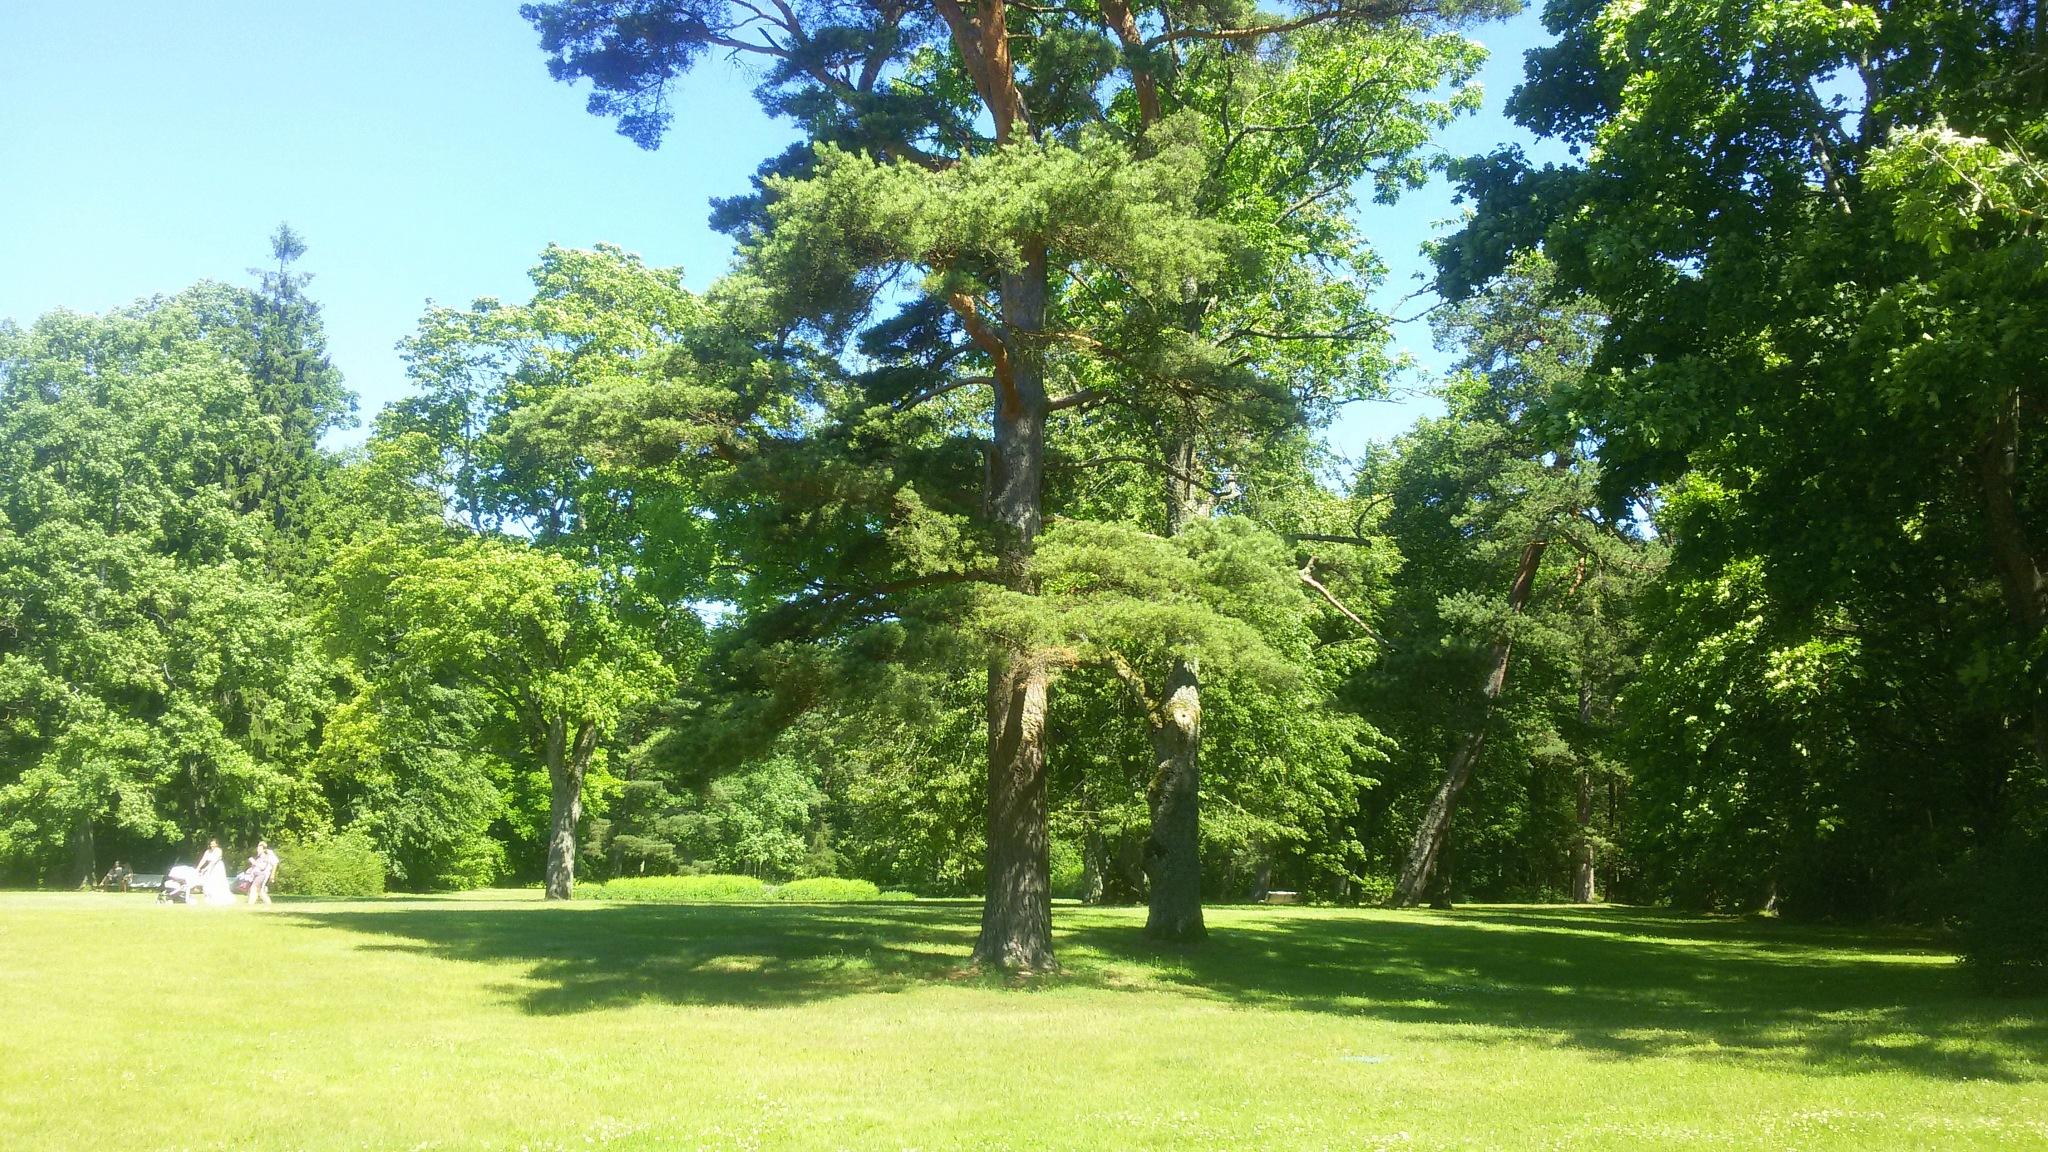 The park trees by uzkuraitiene62